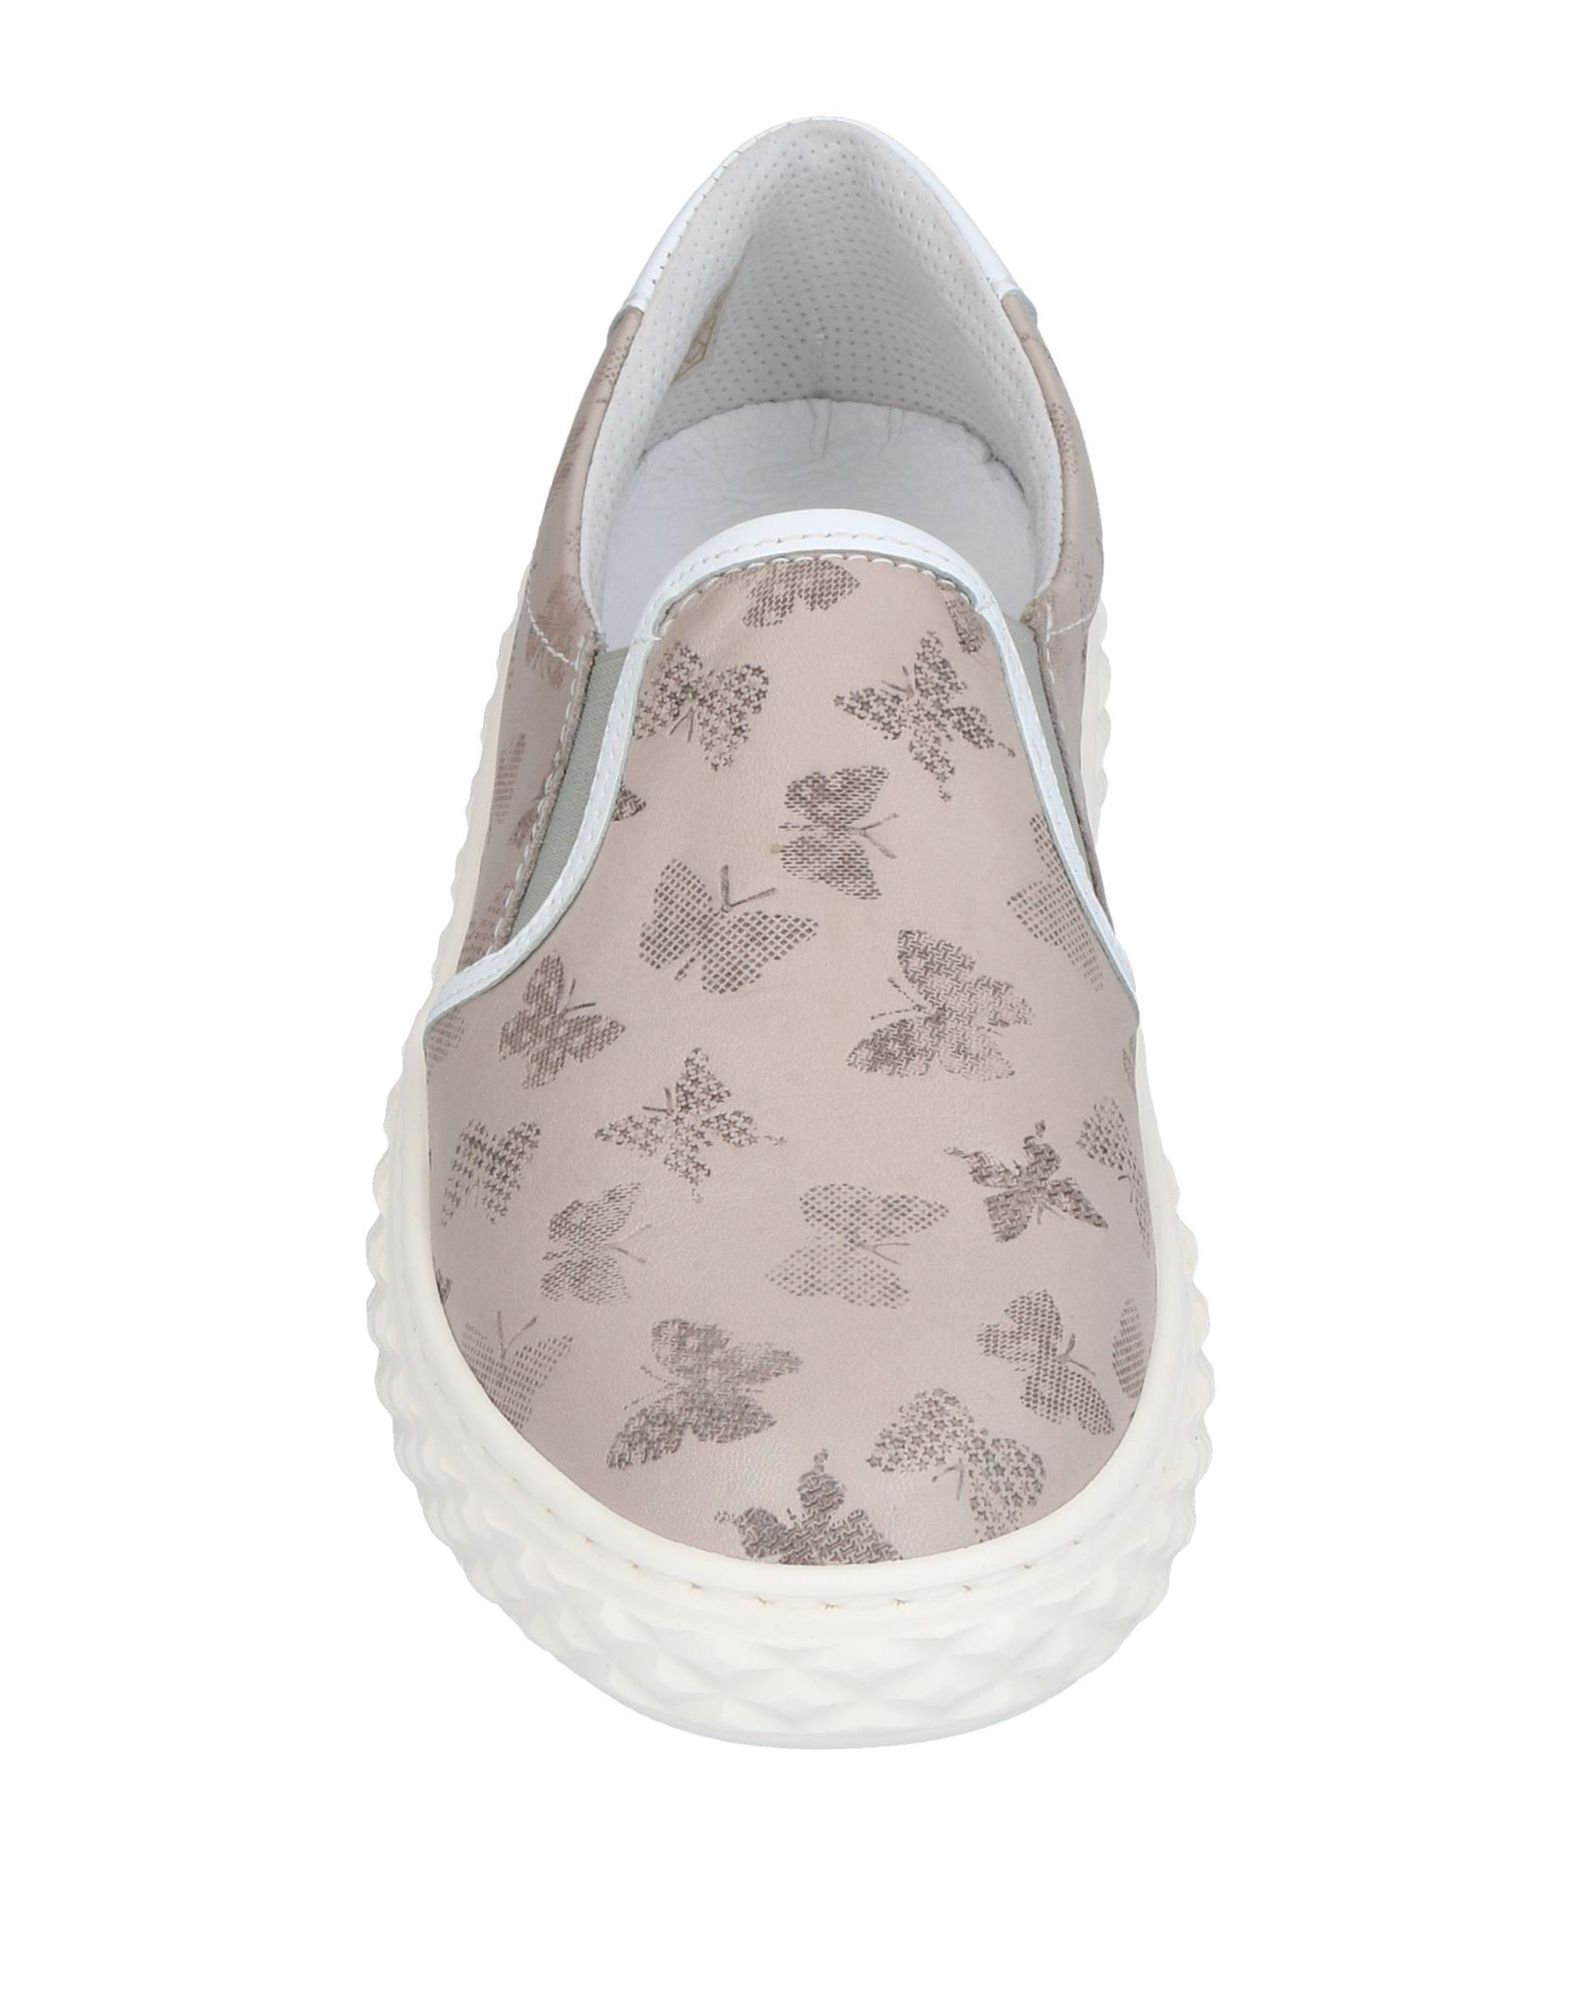 Damen Cafènoir Sneakers Damen   11380669DG Heiße Schuhe 472924